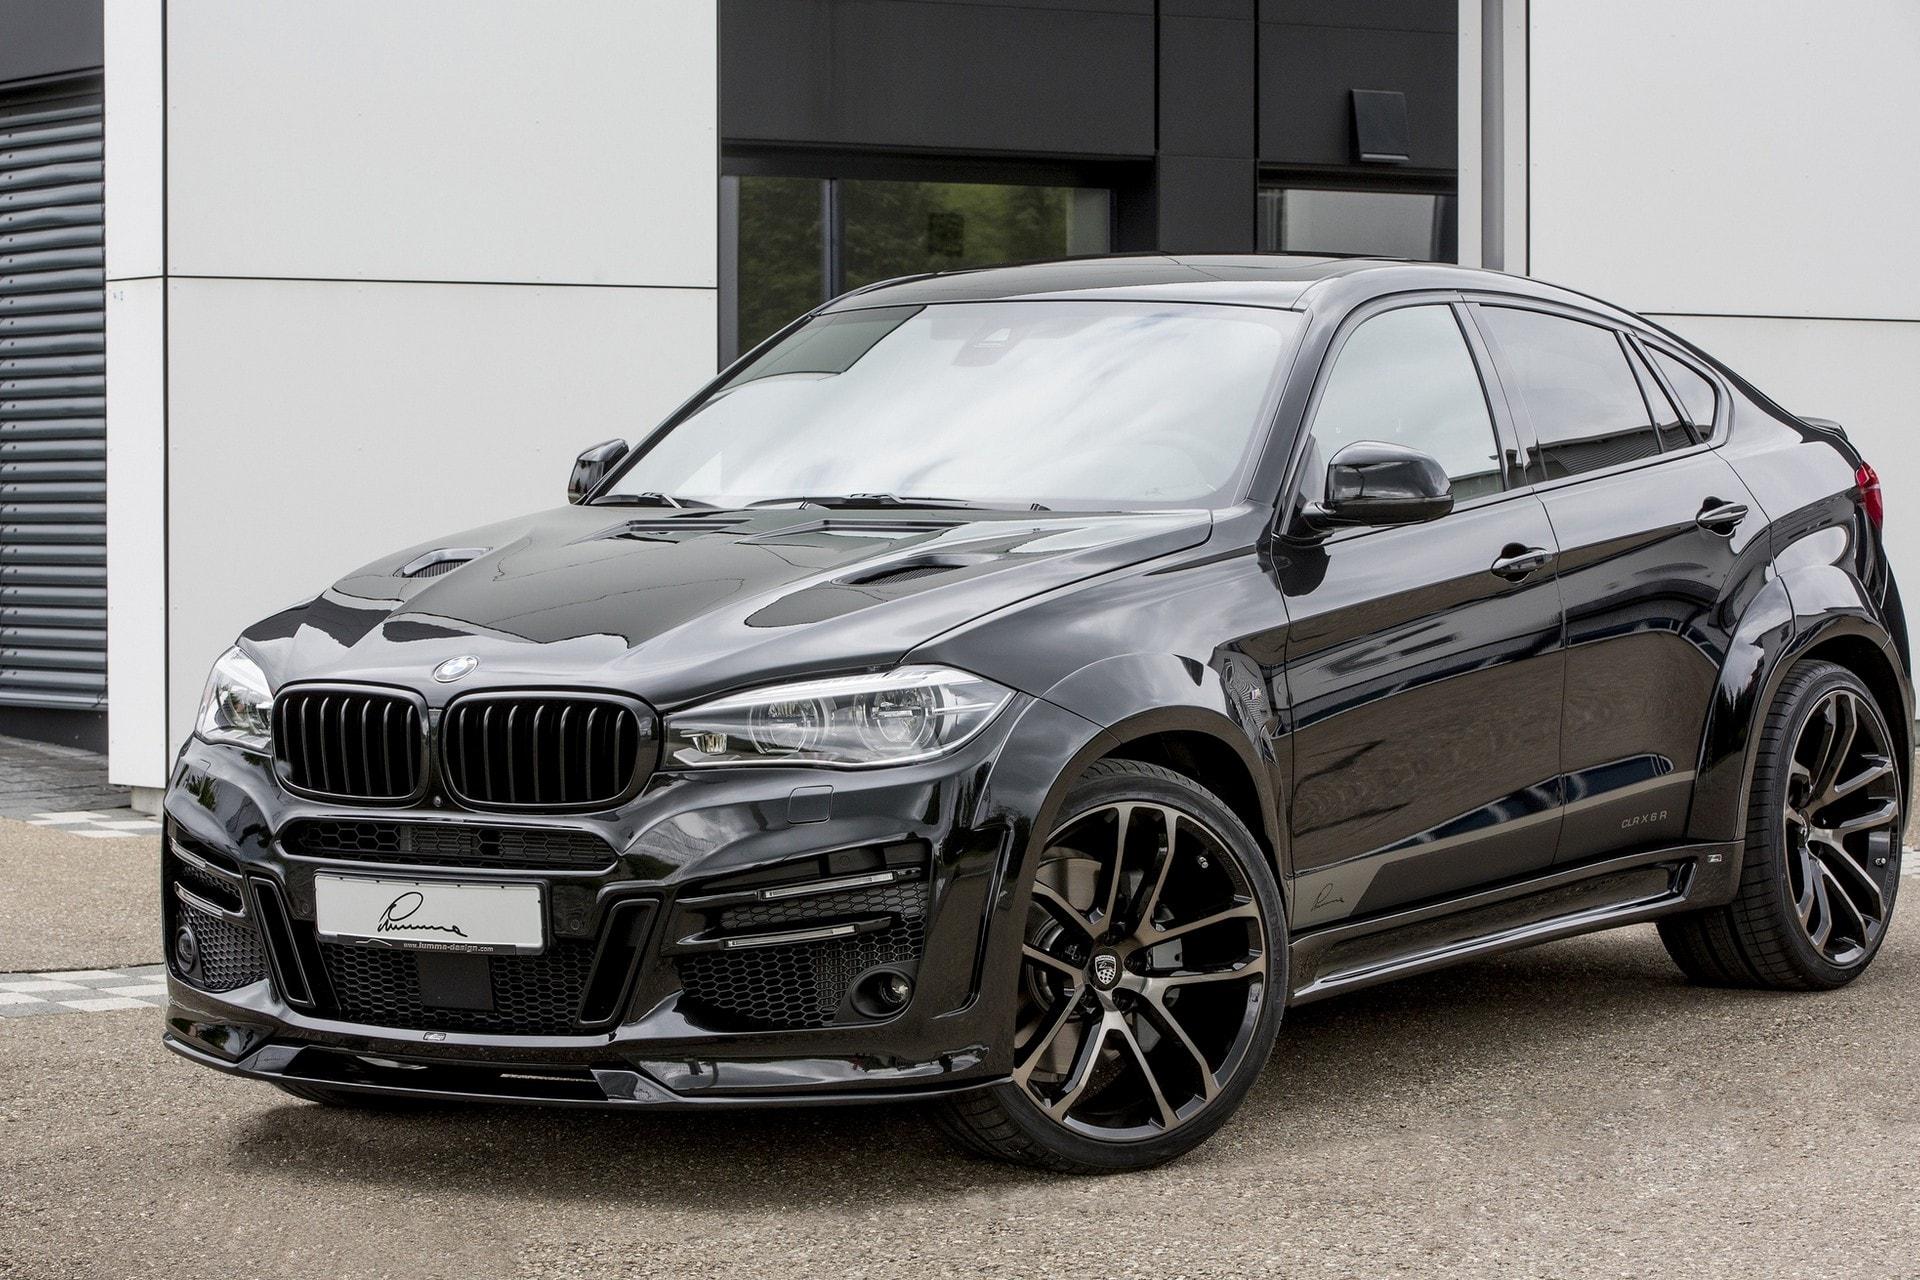 BMW X6 (F16) Widescreen